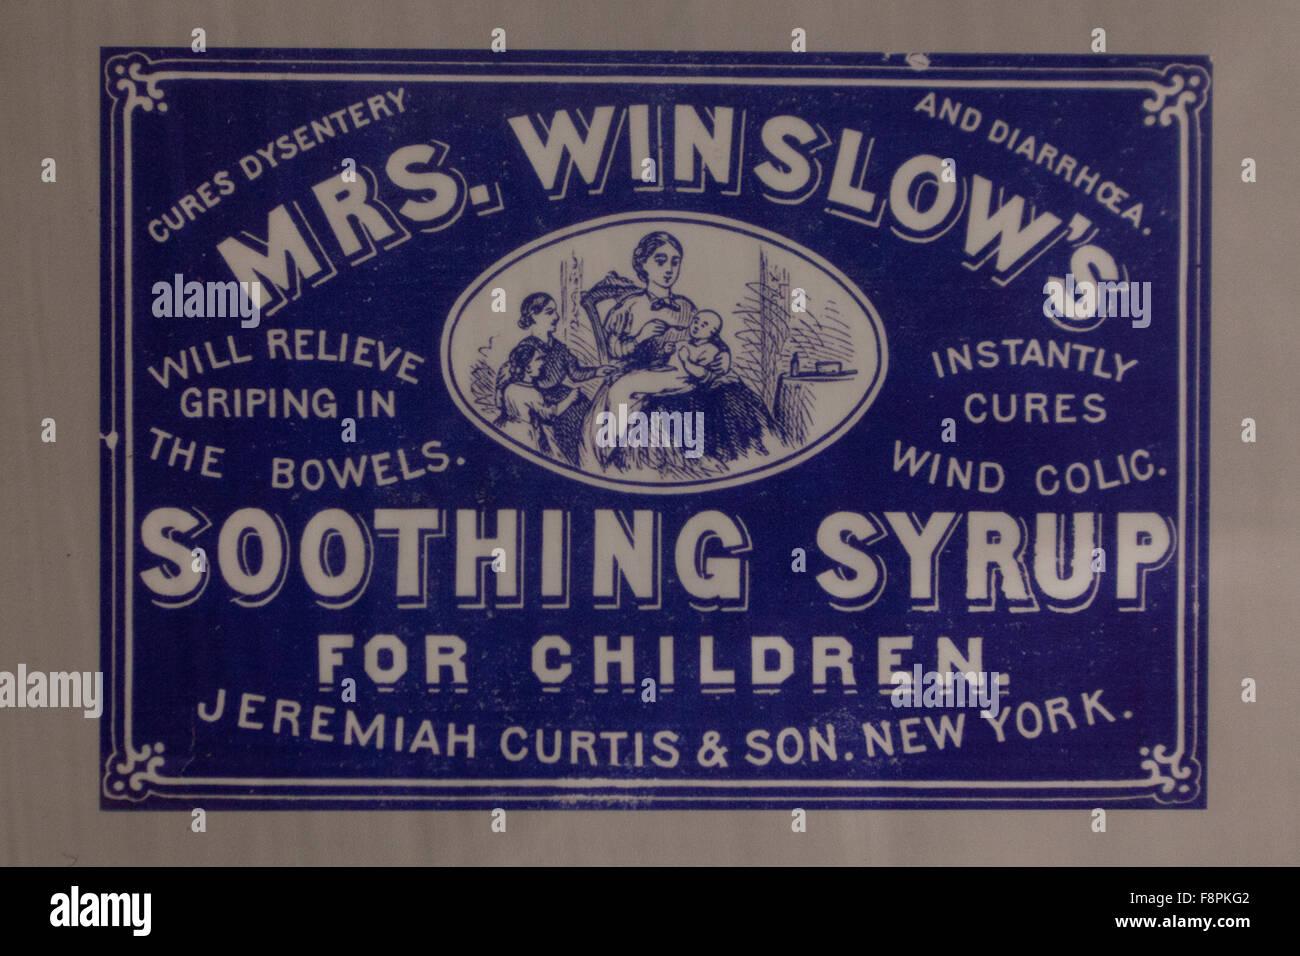 Mrs Winslow beruhigender Sirup für Kinder-Label, um 1900 - DEA Museum, Arlington, Virginia, Vereinigte Staaten Stockbild